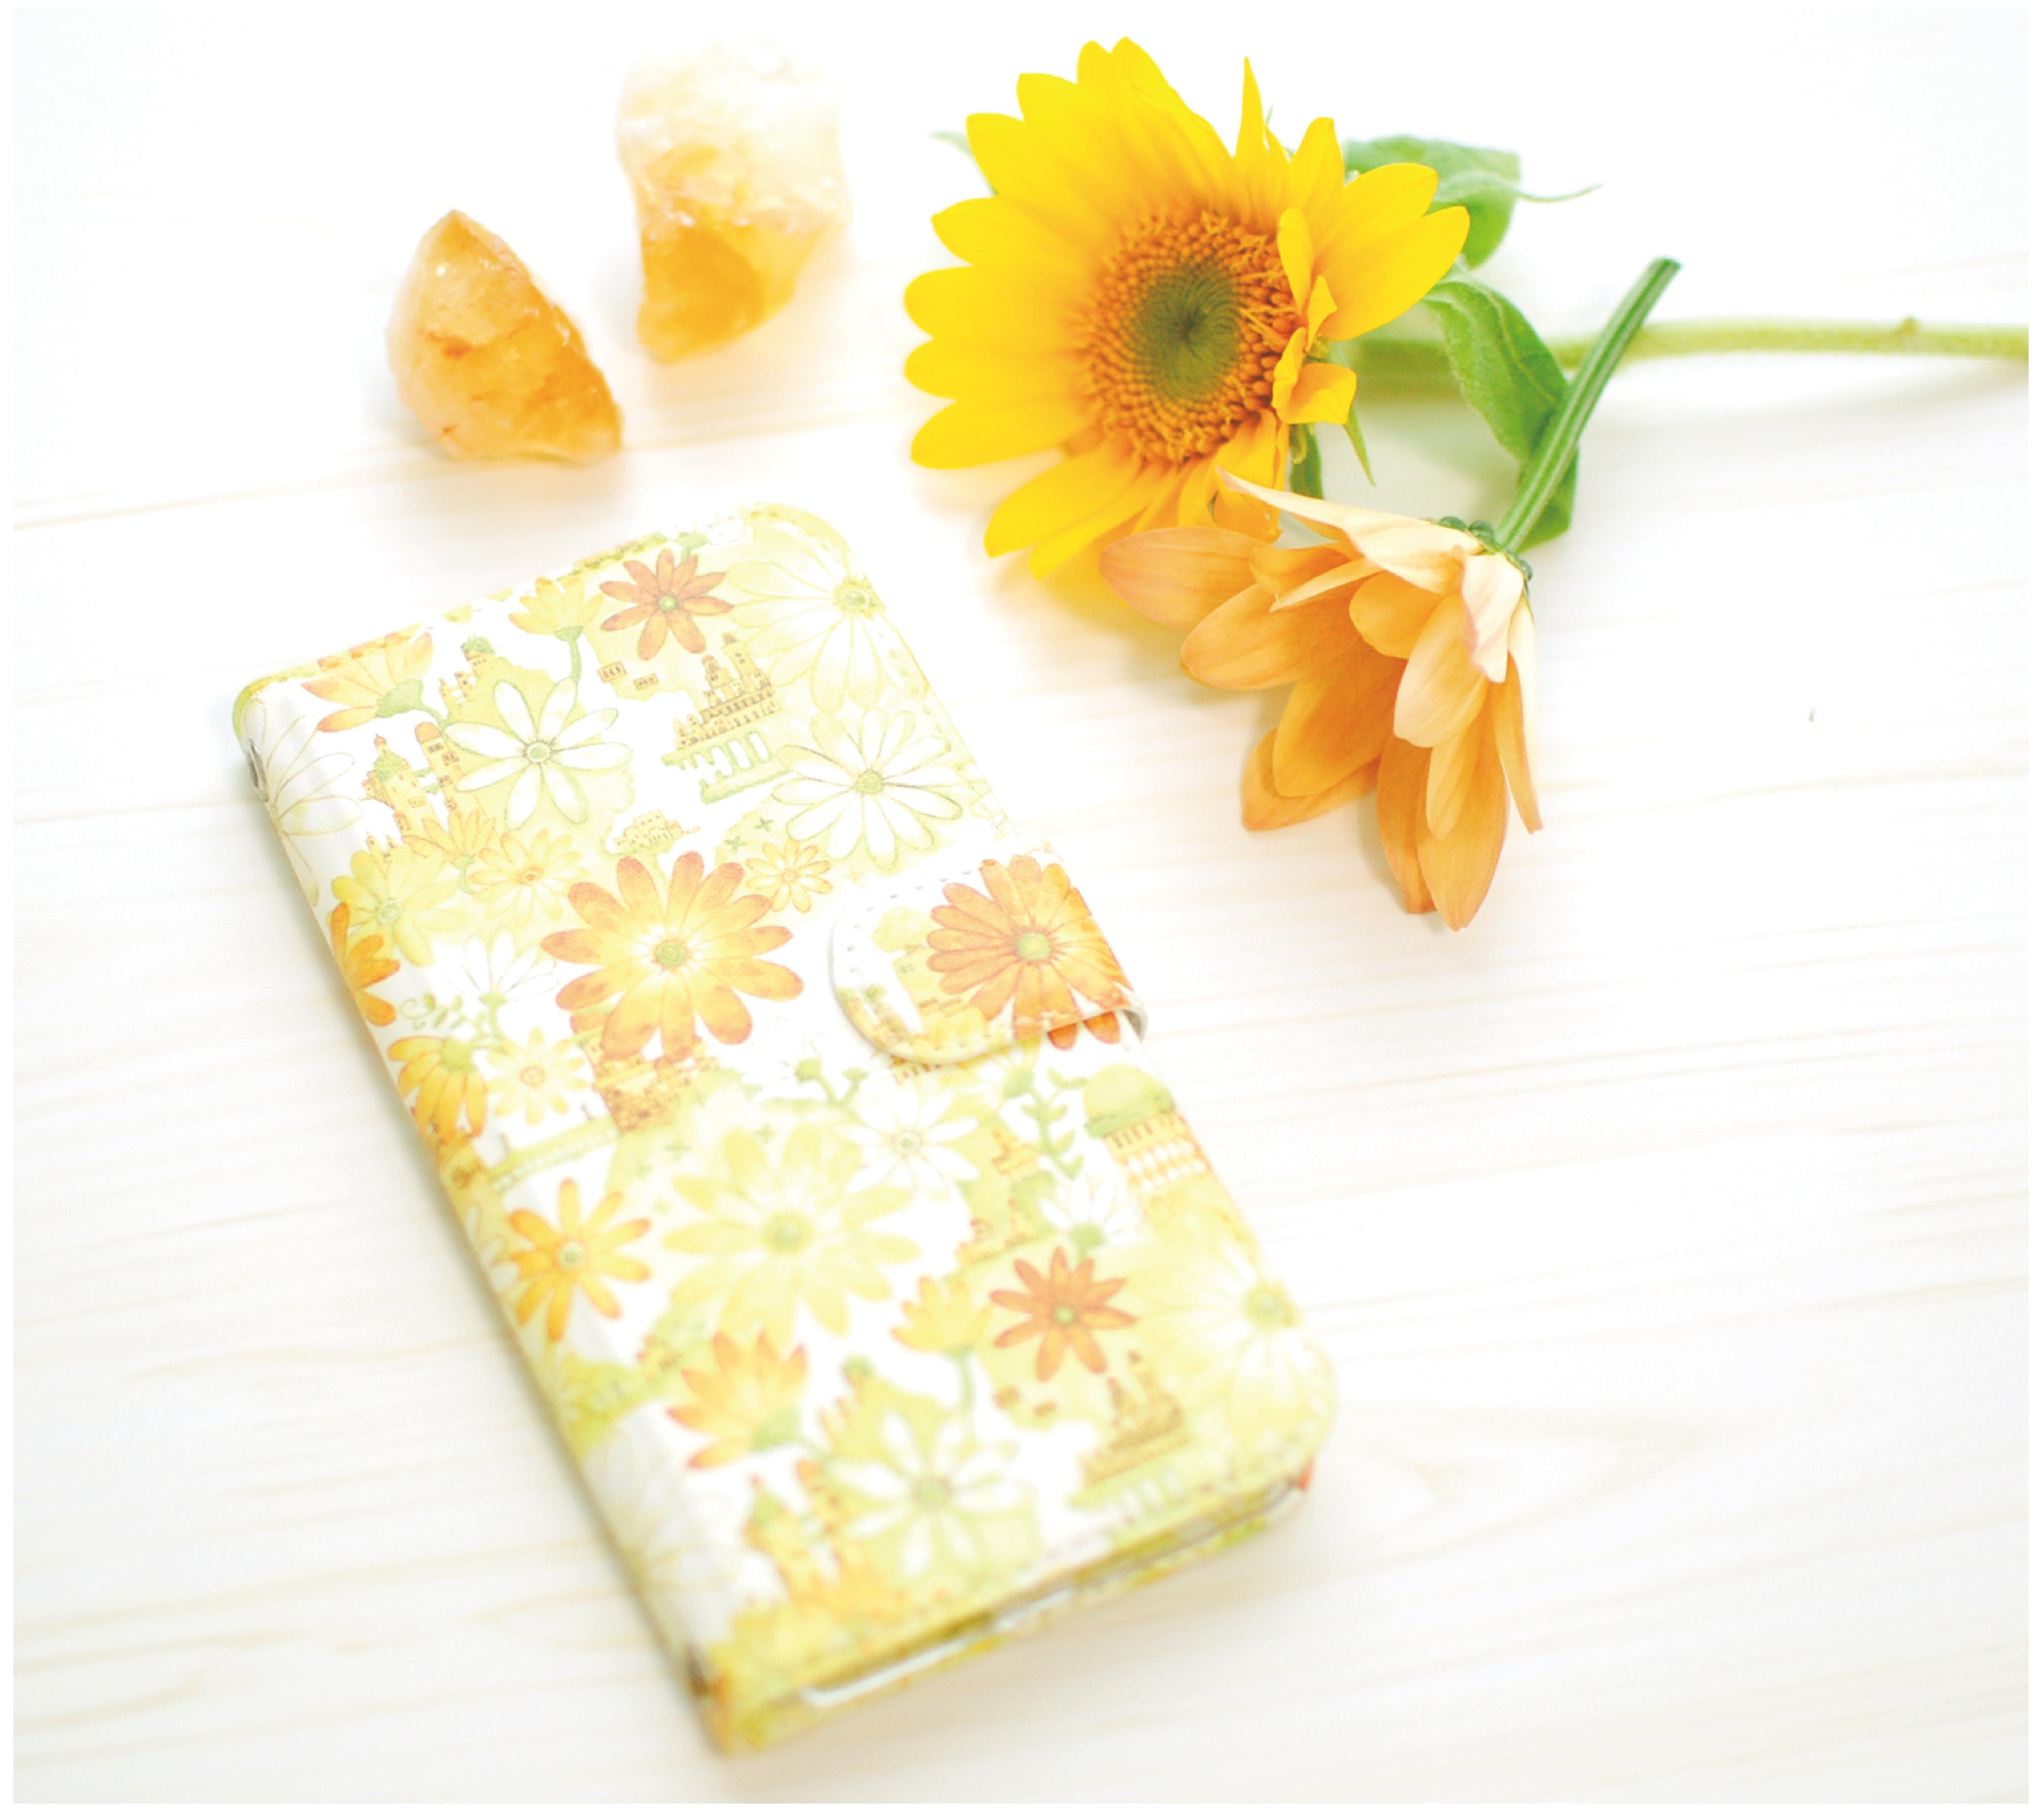 iPhoneSE/6s/7/8/X/Xs 手帳型iPhoneケース「ボタニカルの古都」【内側デザイン可!】